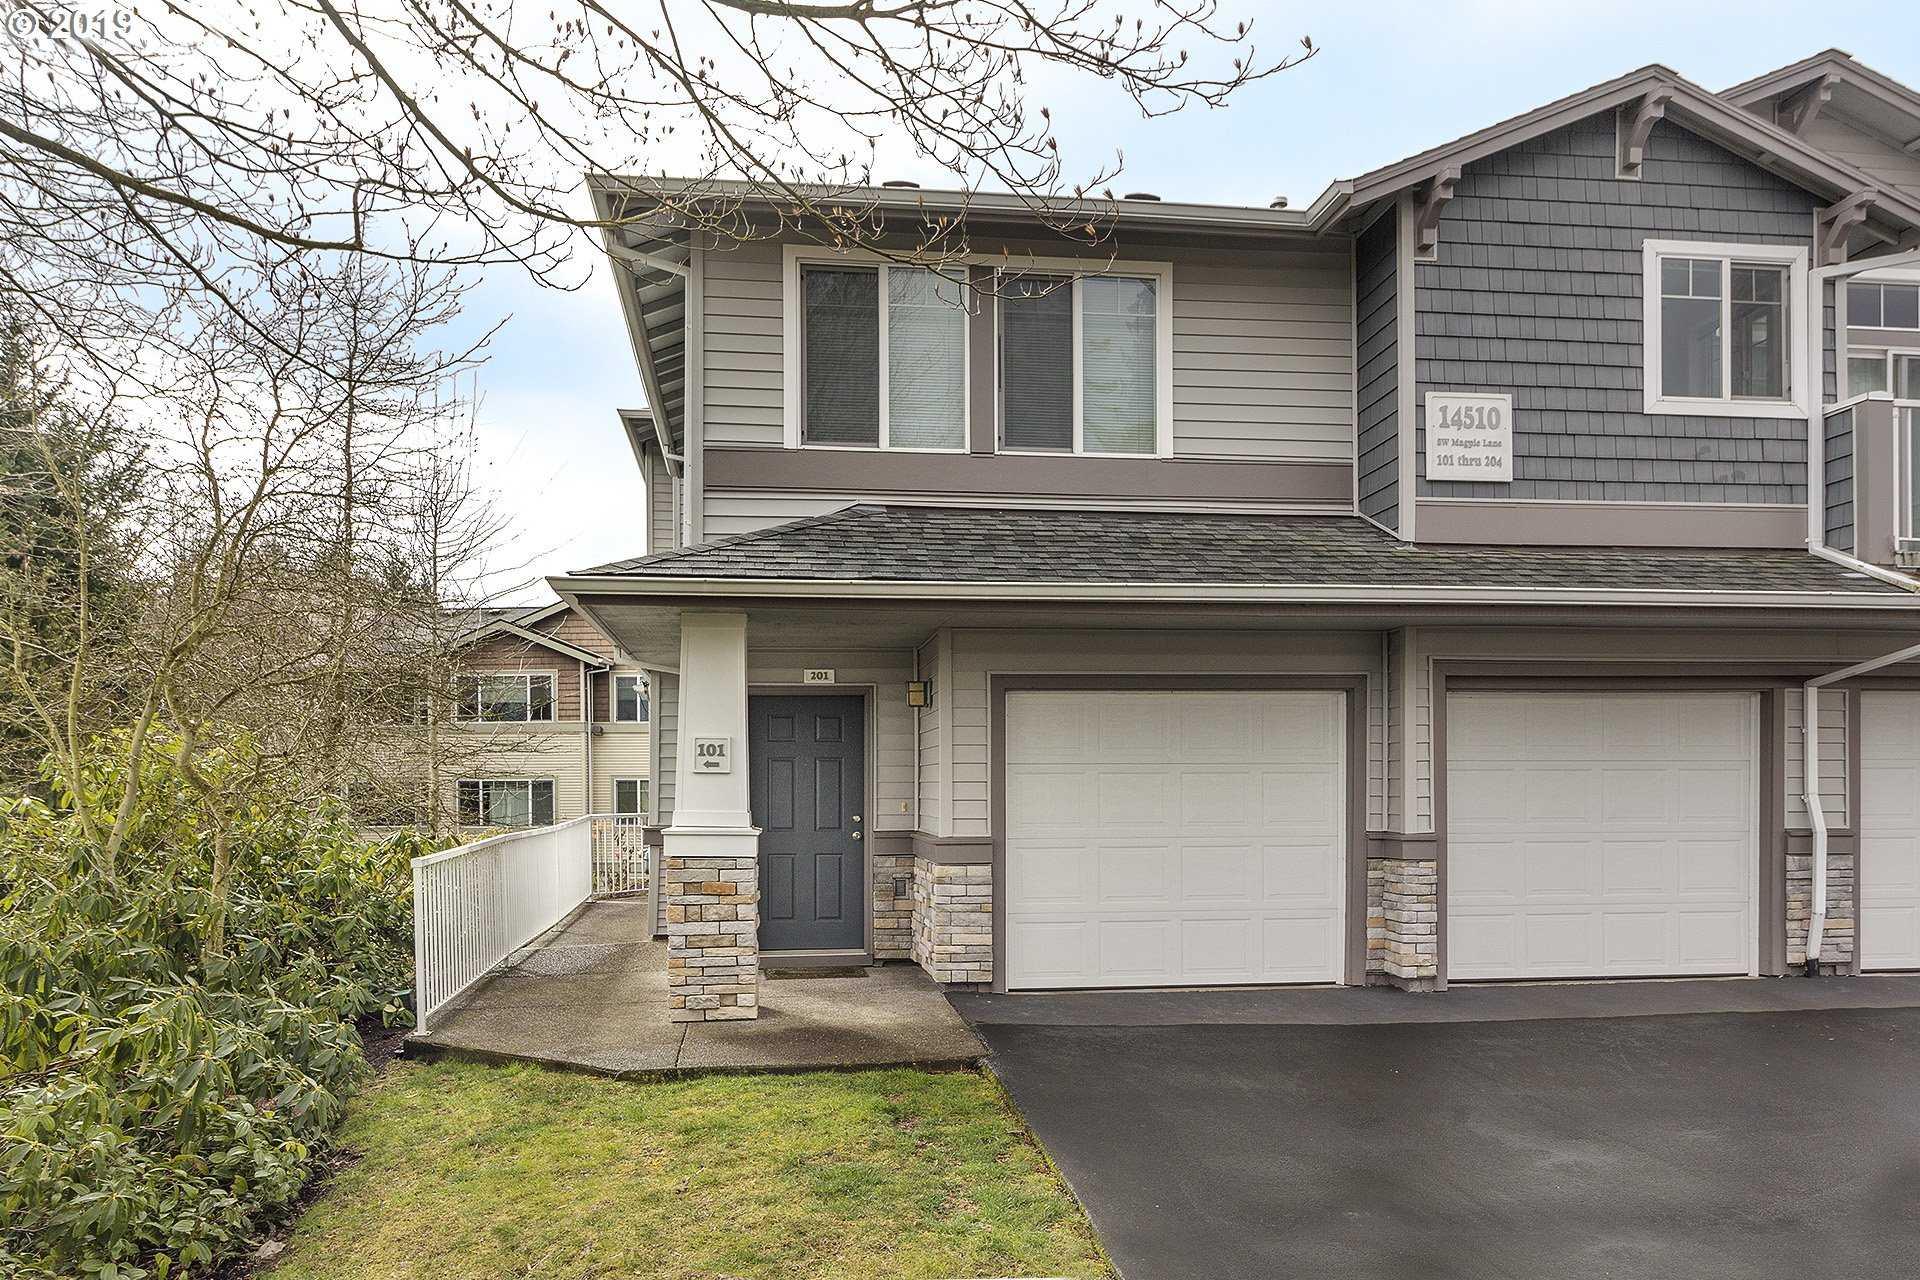 $285,000 - 2Br/2Ba -  for Sale in Progress Ridge, Beaverton